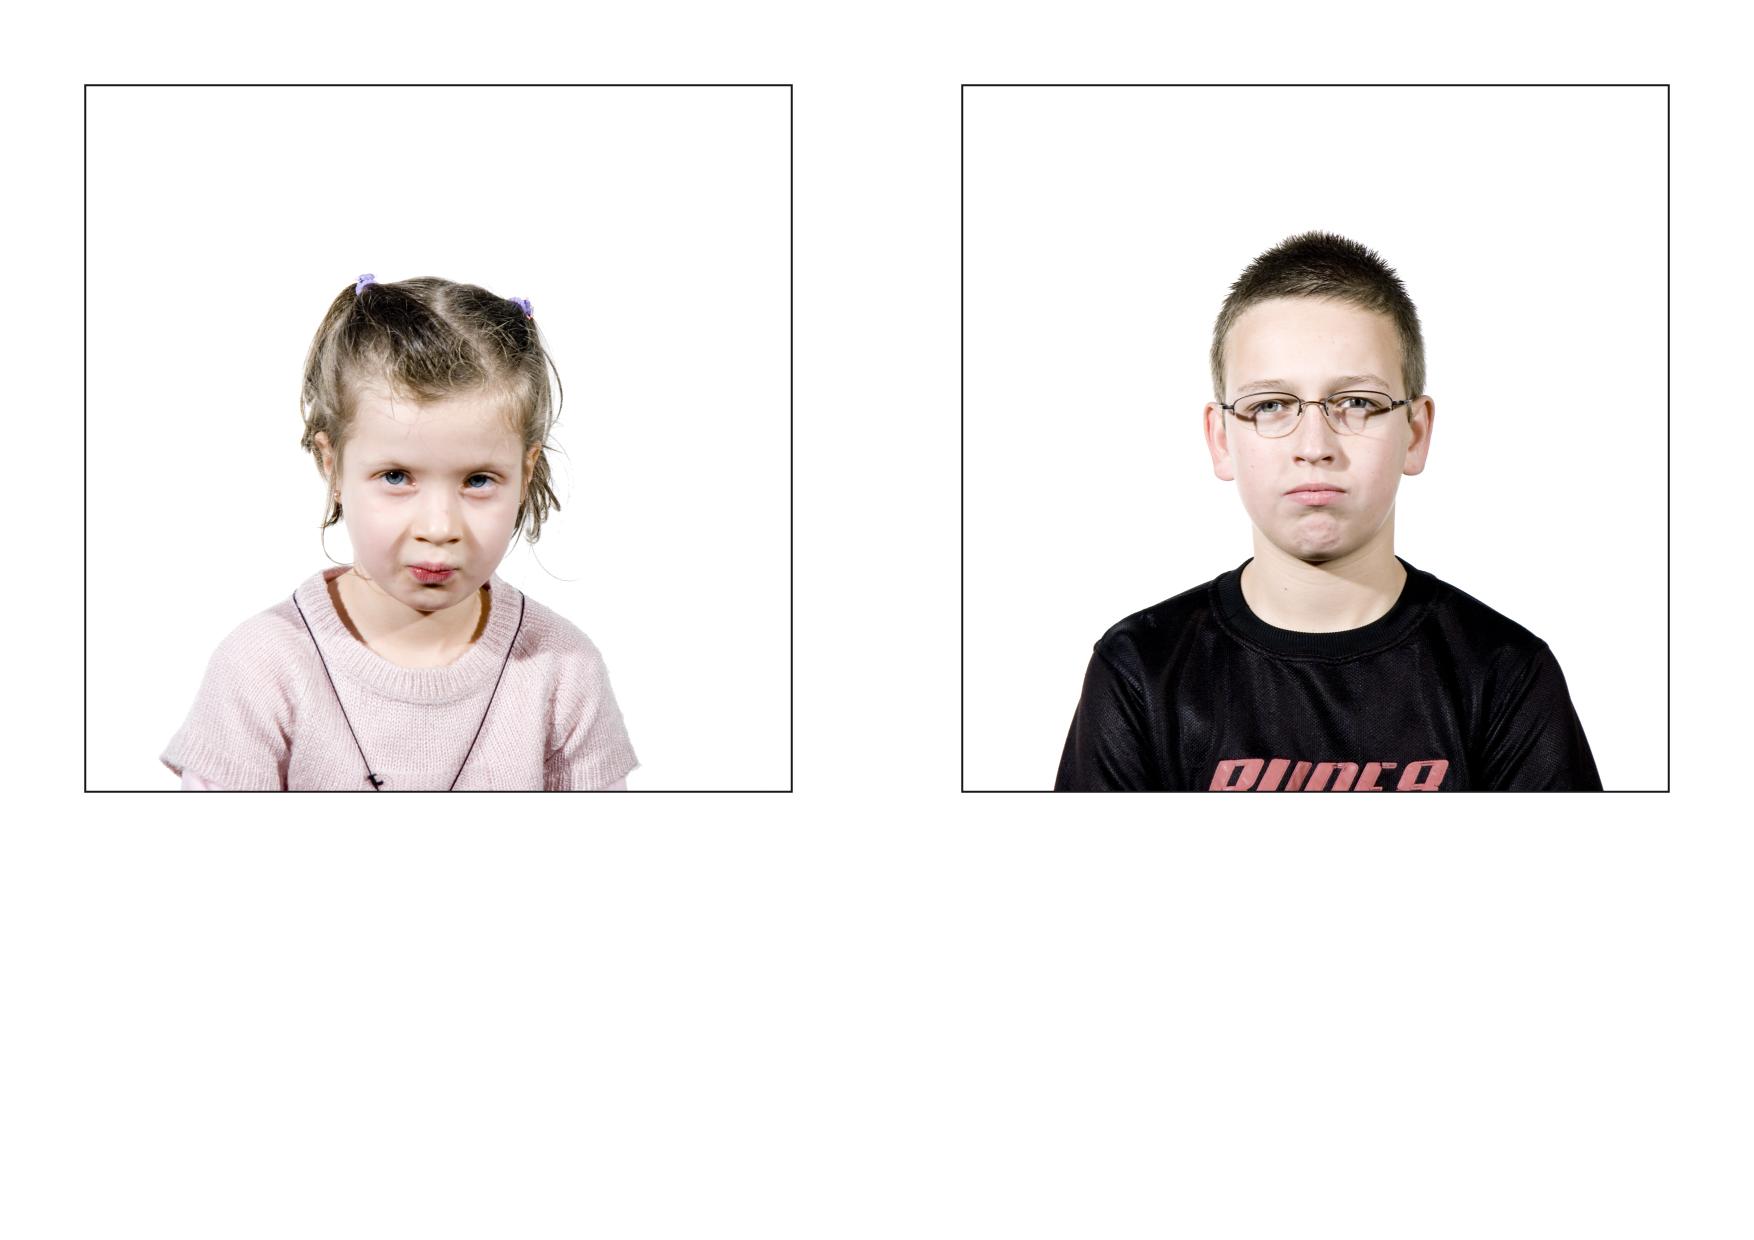 portraits-1-p4-5.jpg